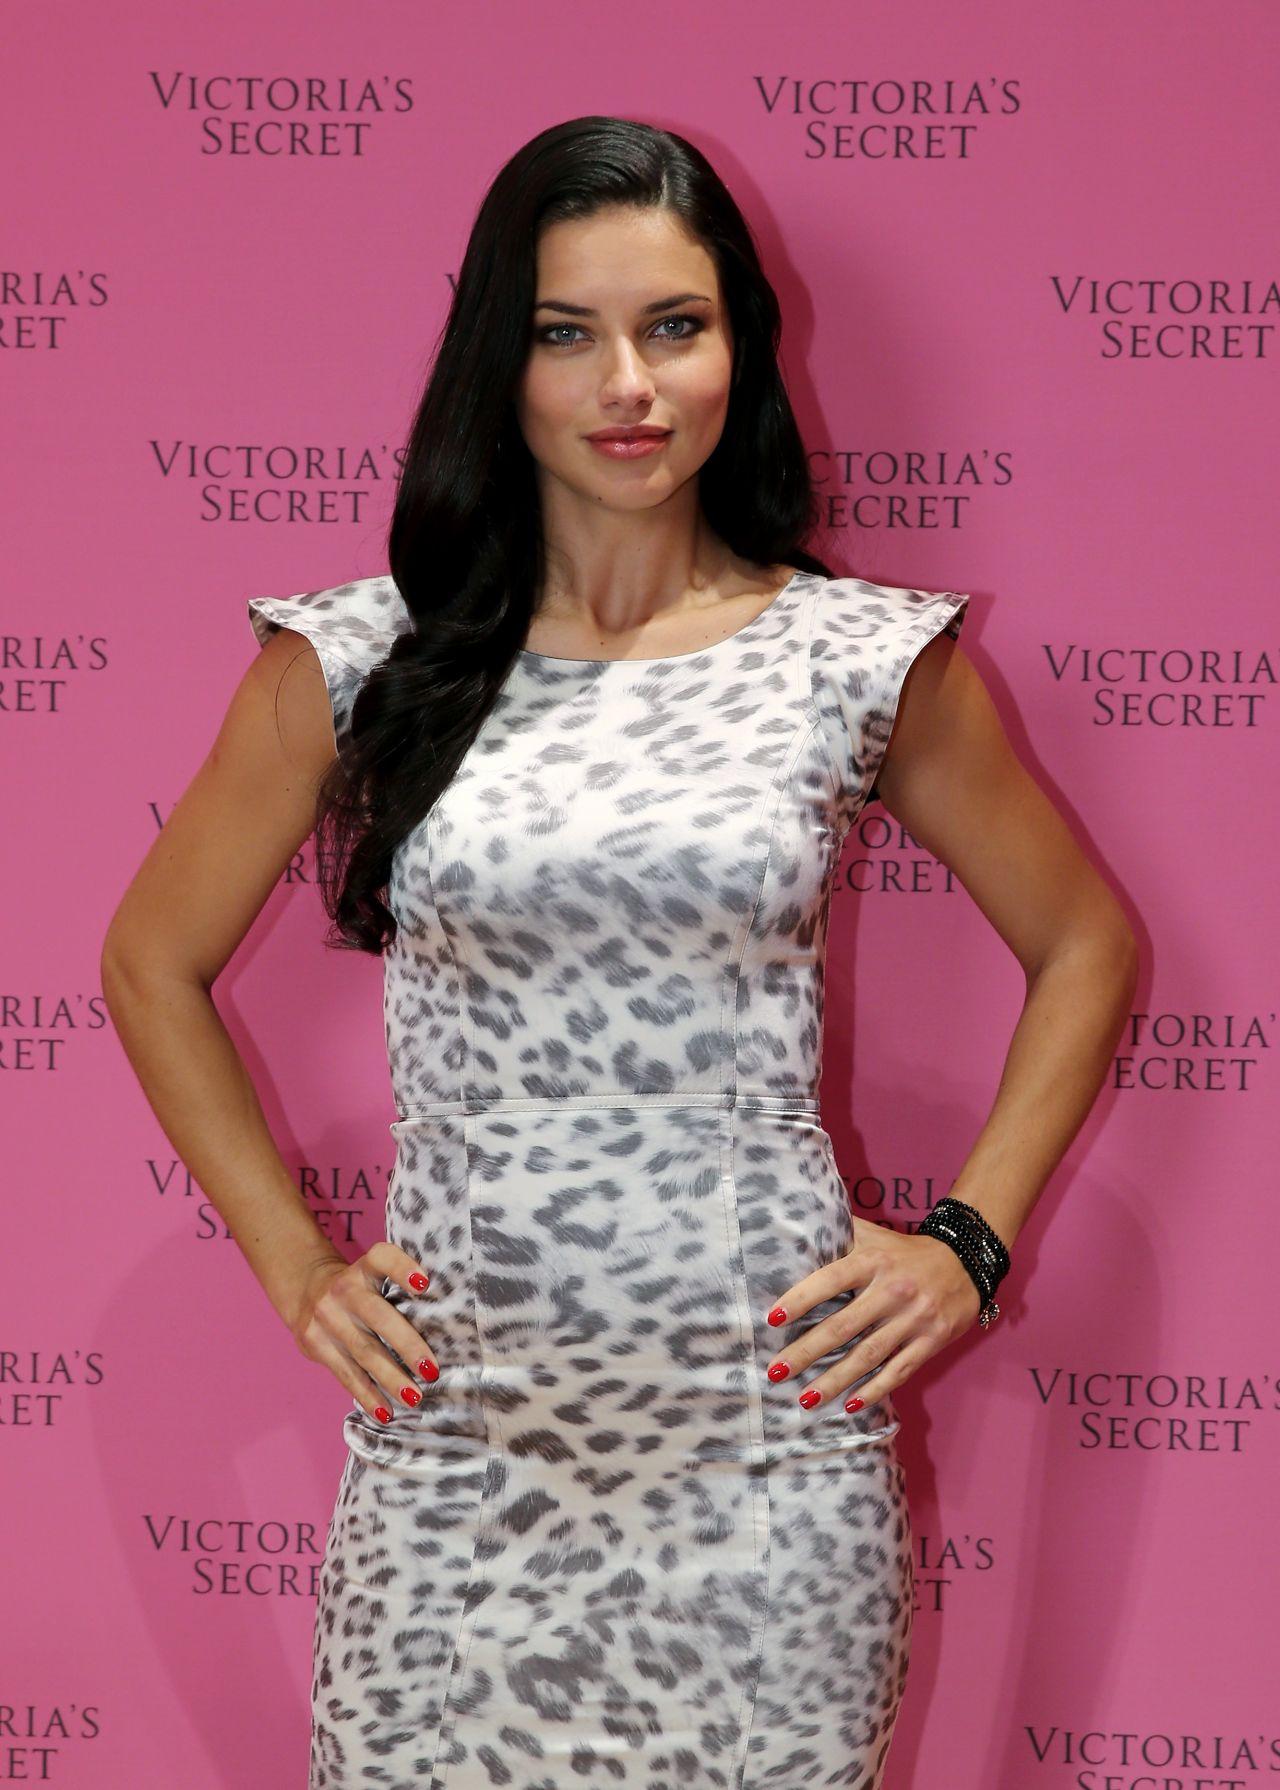 Adriana Lima - Victoria